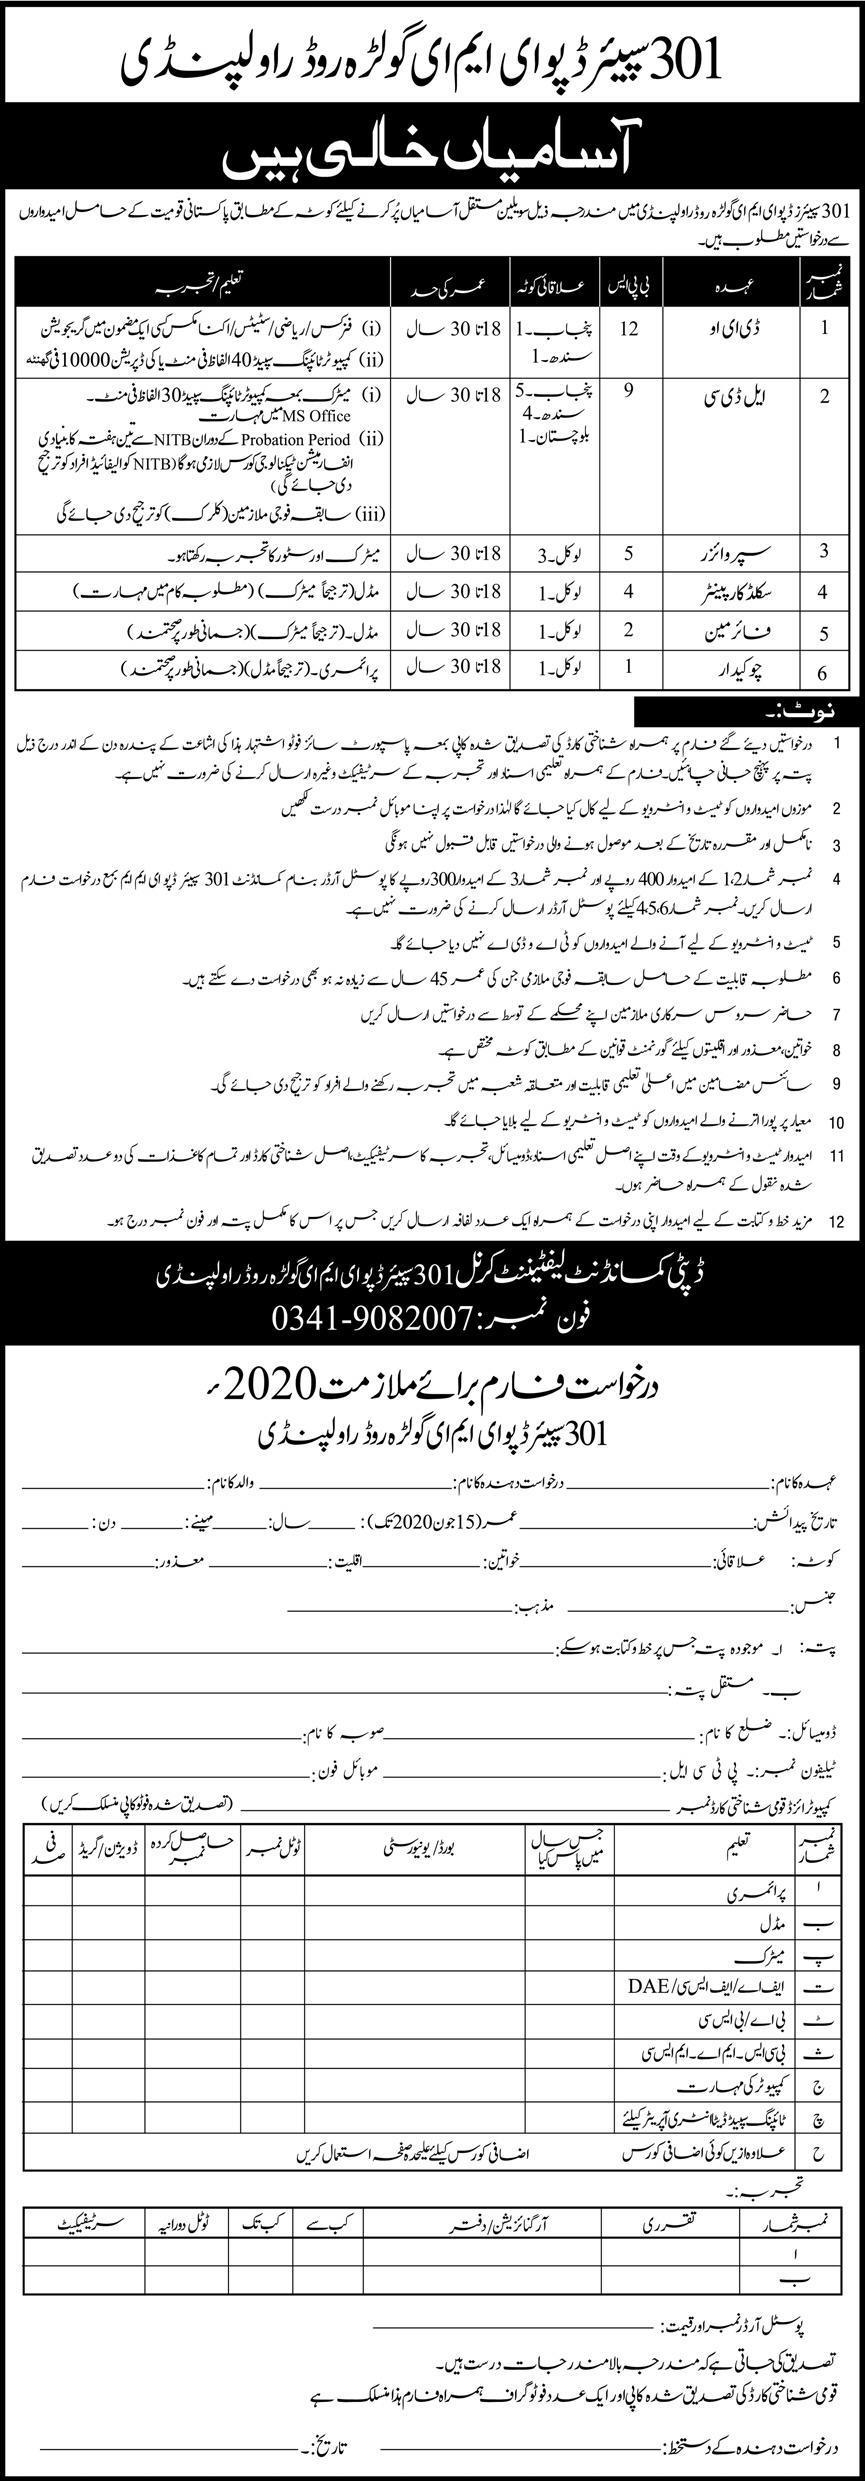 Join Pak Army 301 Spare Depot EME Rawalpindi Jobs 2020